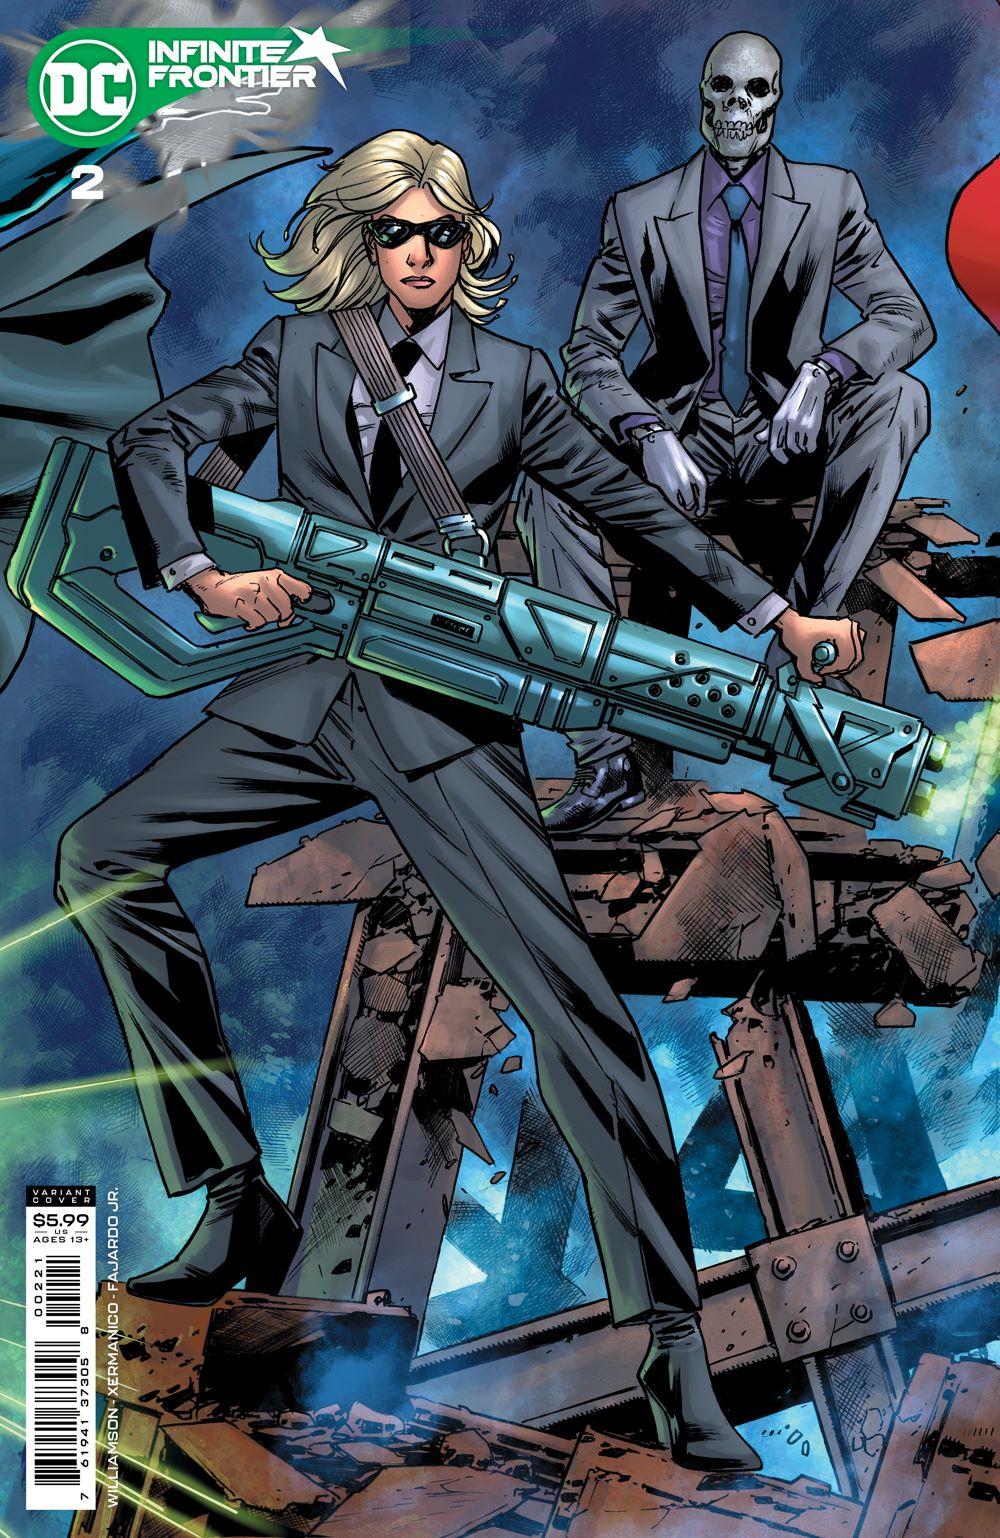 INFINITE_FRONTIER_Cv2_var DC Comics July 2021 Solicitations